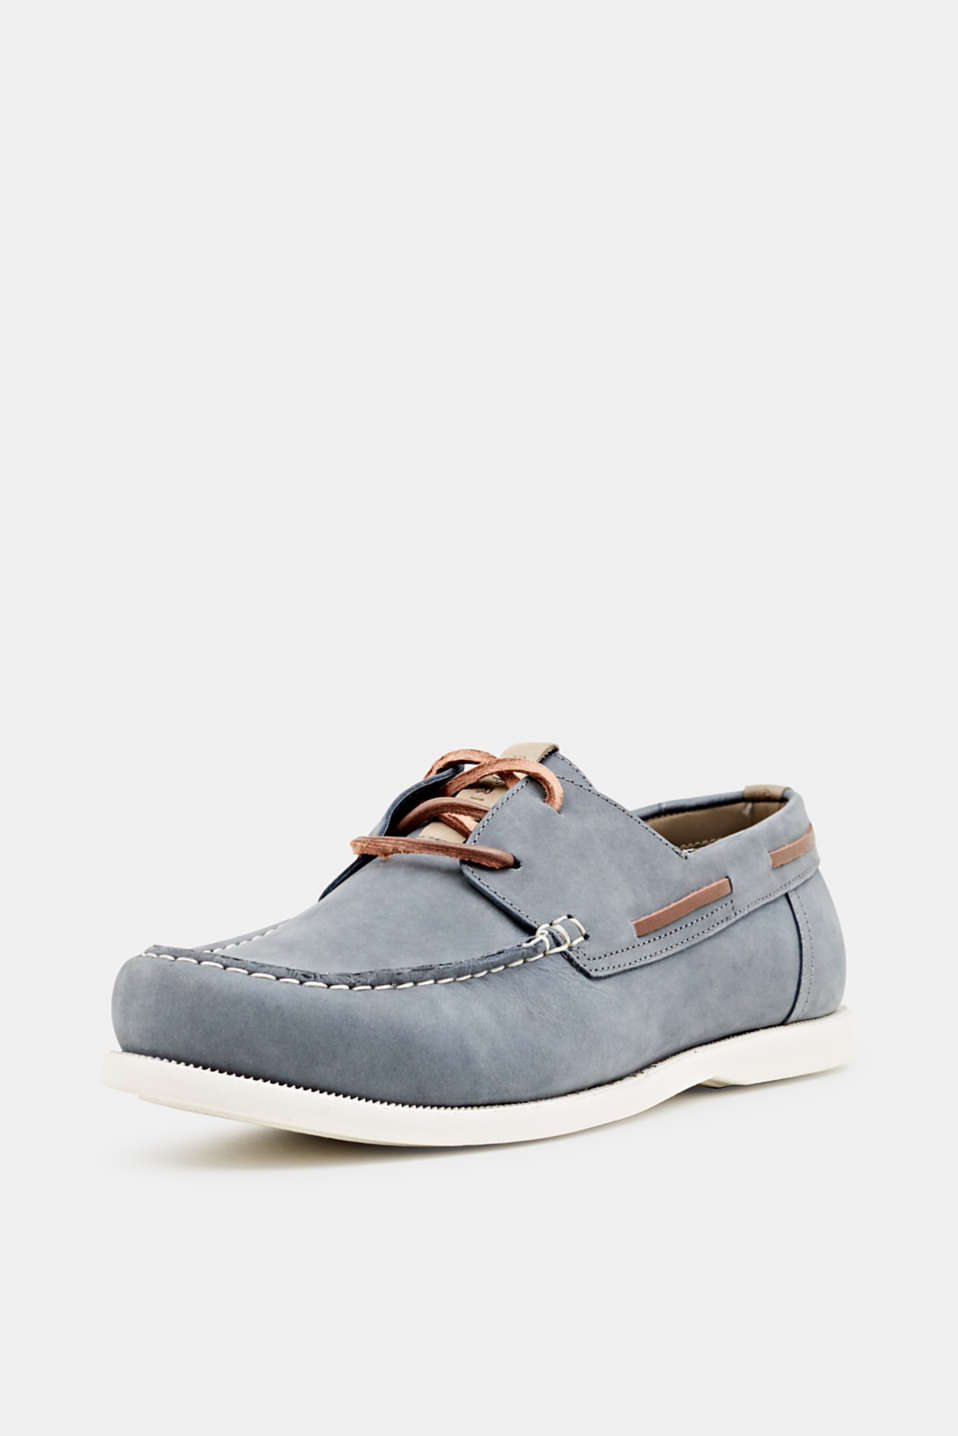 Leather boat shoes, LIGHT BLUE, detail image number 1